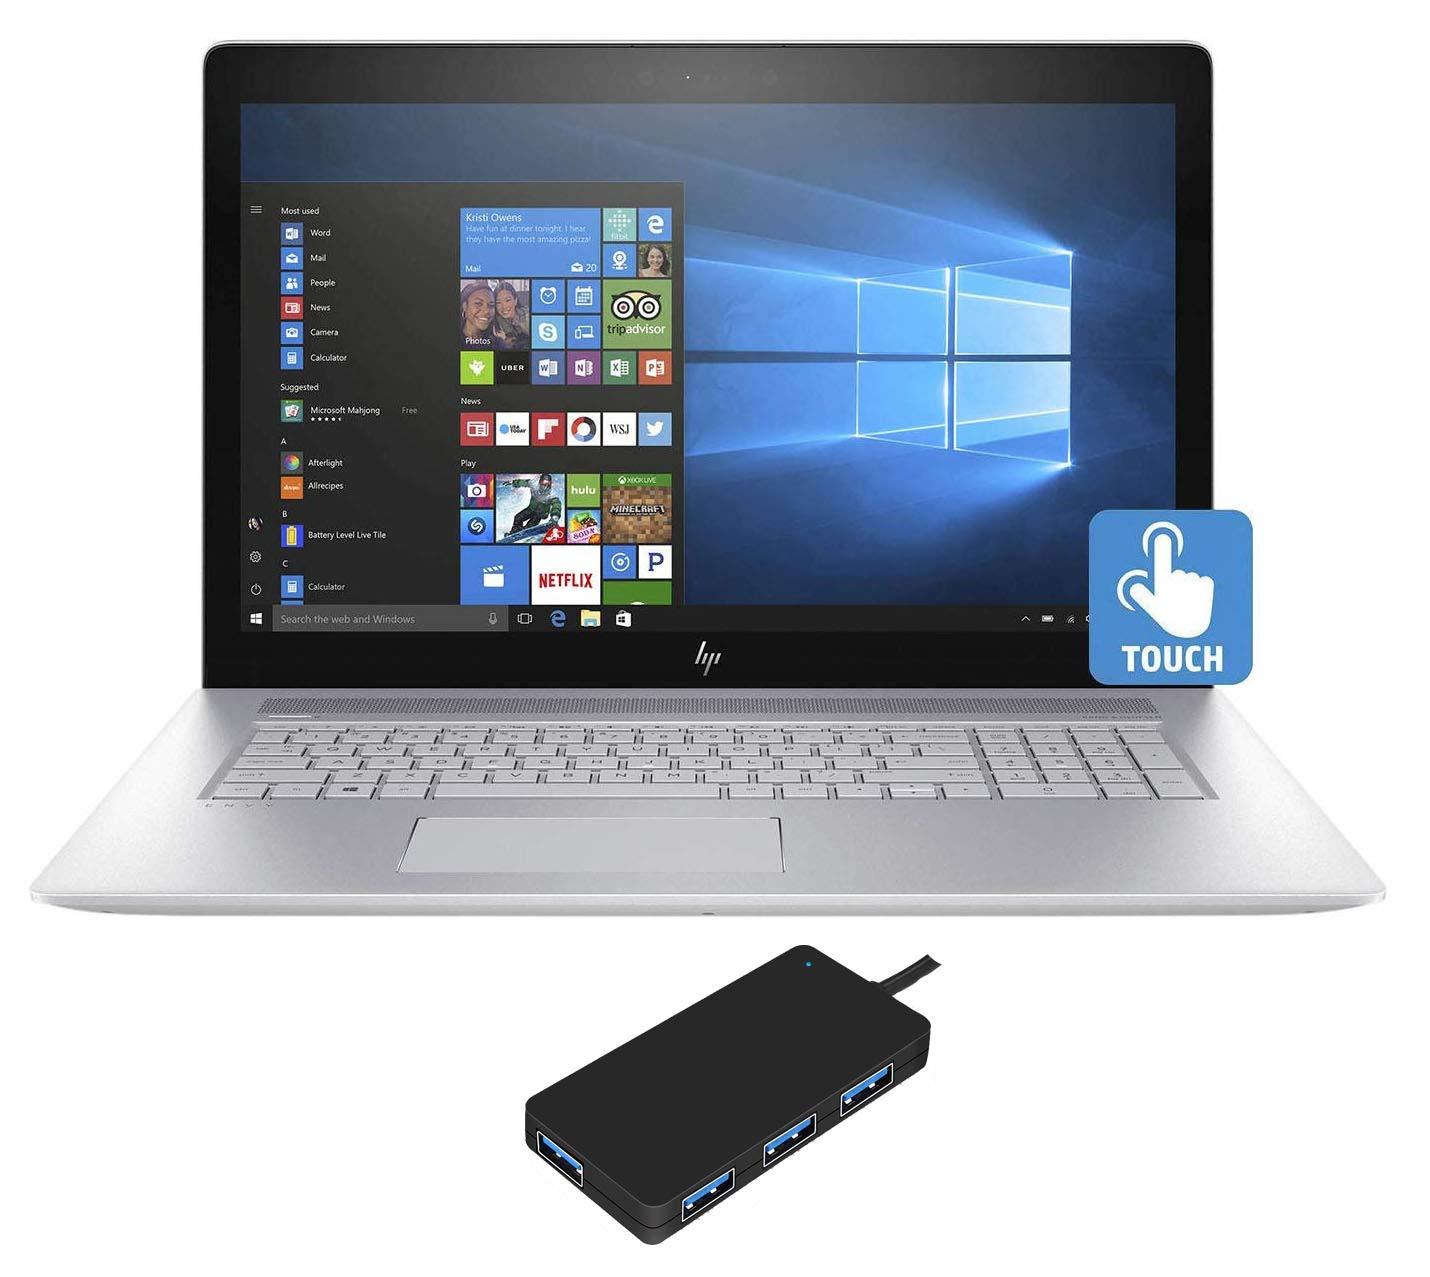 "HP Envy - 17t (2019) 10th Gen Laptop (Intel i7-10510U 4-Core, 16GB RAM, 512GB PCIe SSD, NVIDIA GeForce MX250, 17.3"" Touch Full HD (1920x1080), Fingerprint, WiFi, Bluetooth, Webcam, Win 10 Pro)"